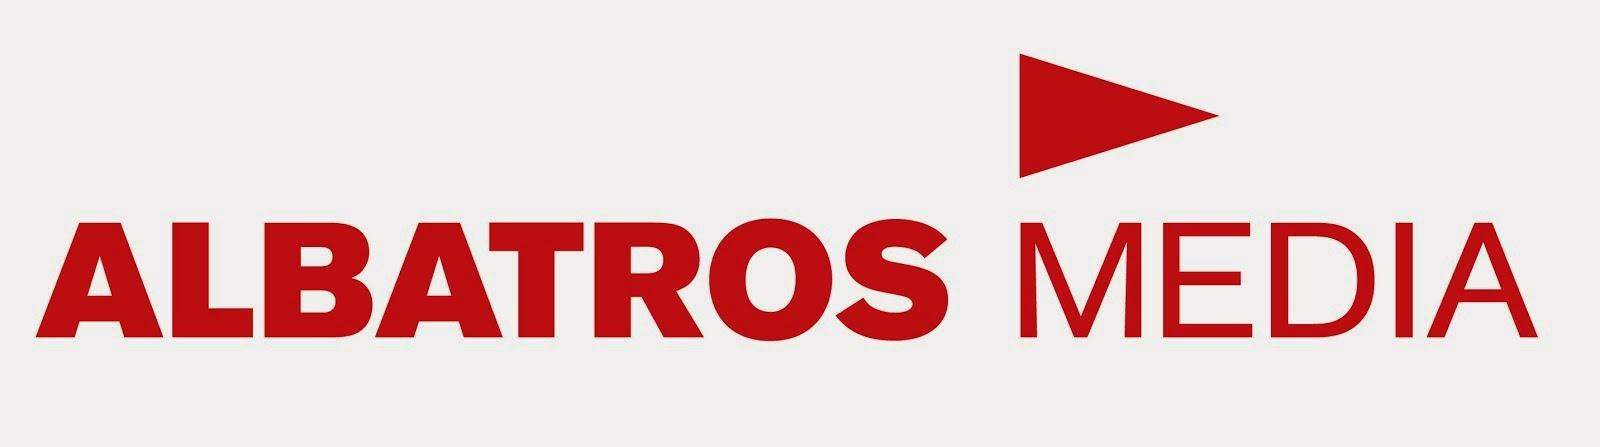 Albatros Media